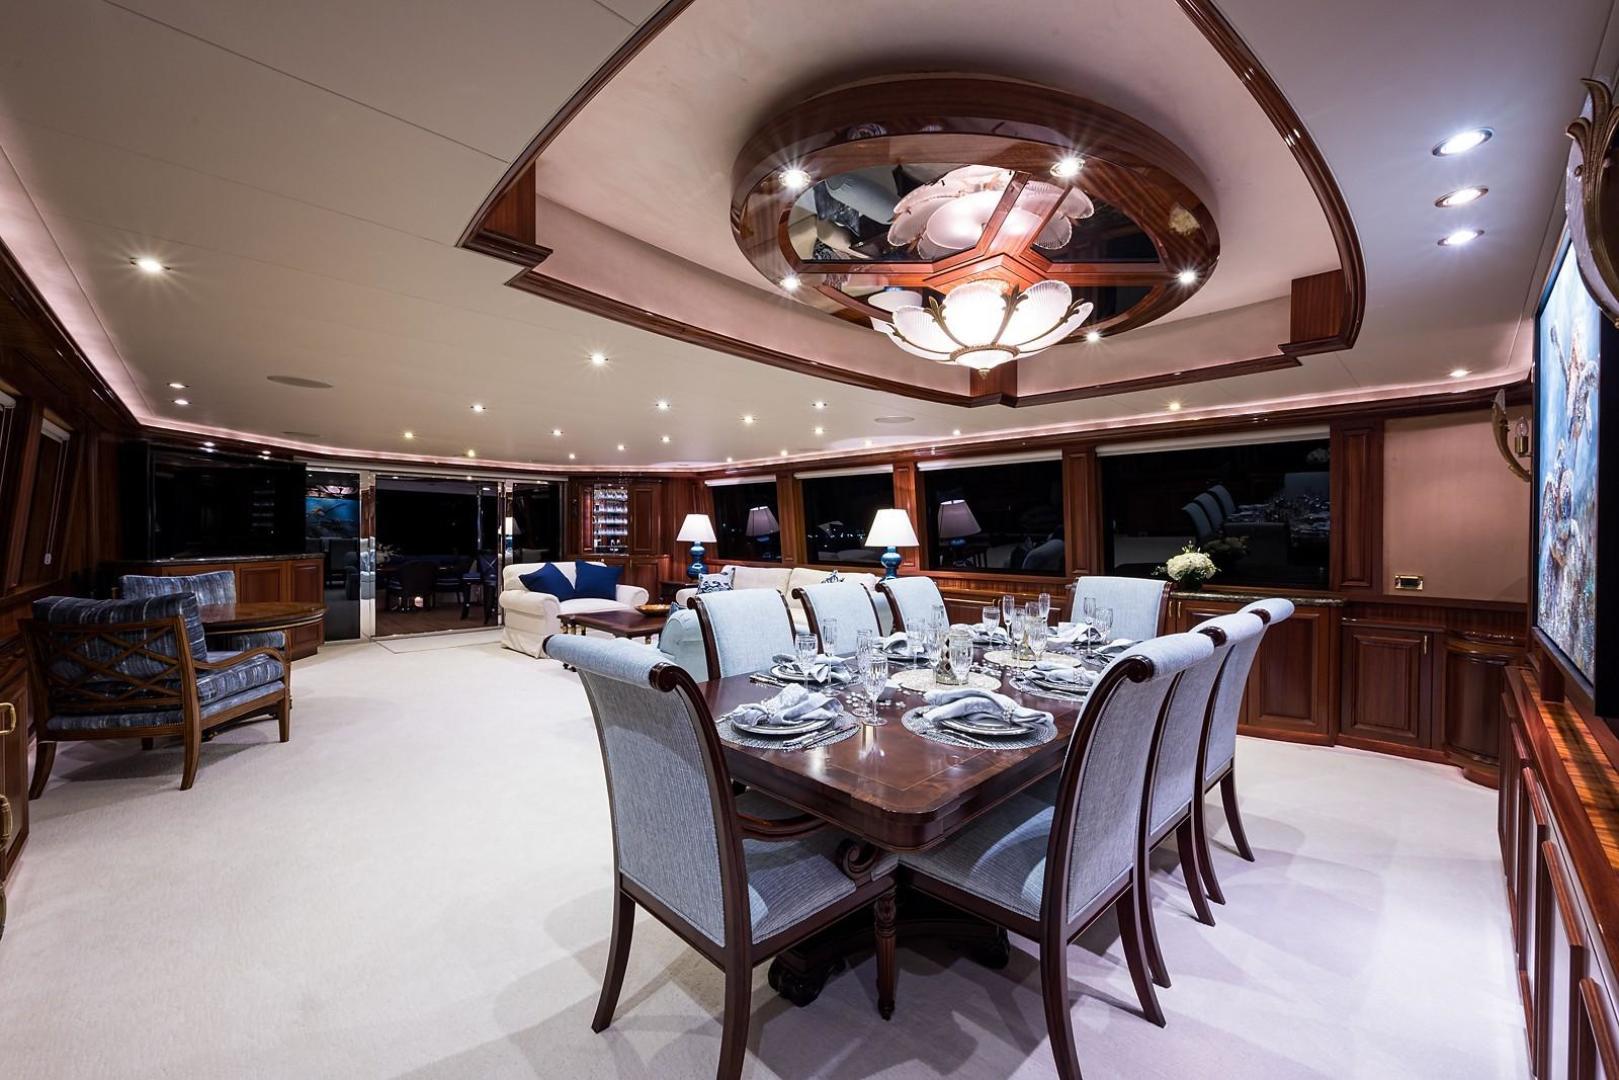 Westport-Motoryacht 2010-Cavallino Fort Lauderdale-Florida-United States-Dining-1270124 | Thumbnail